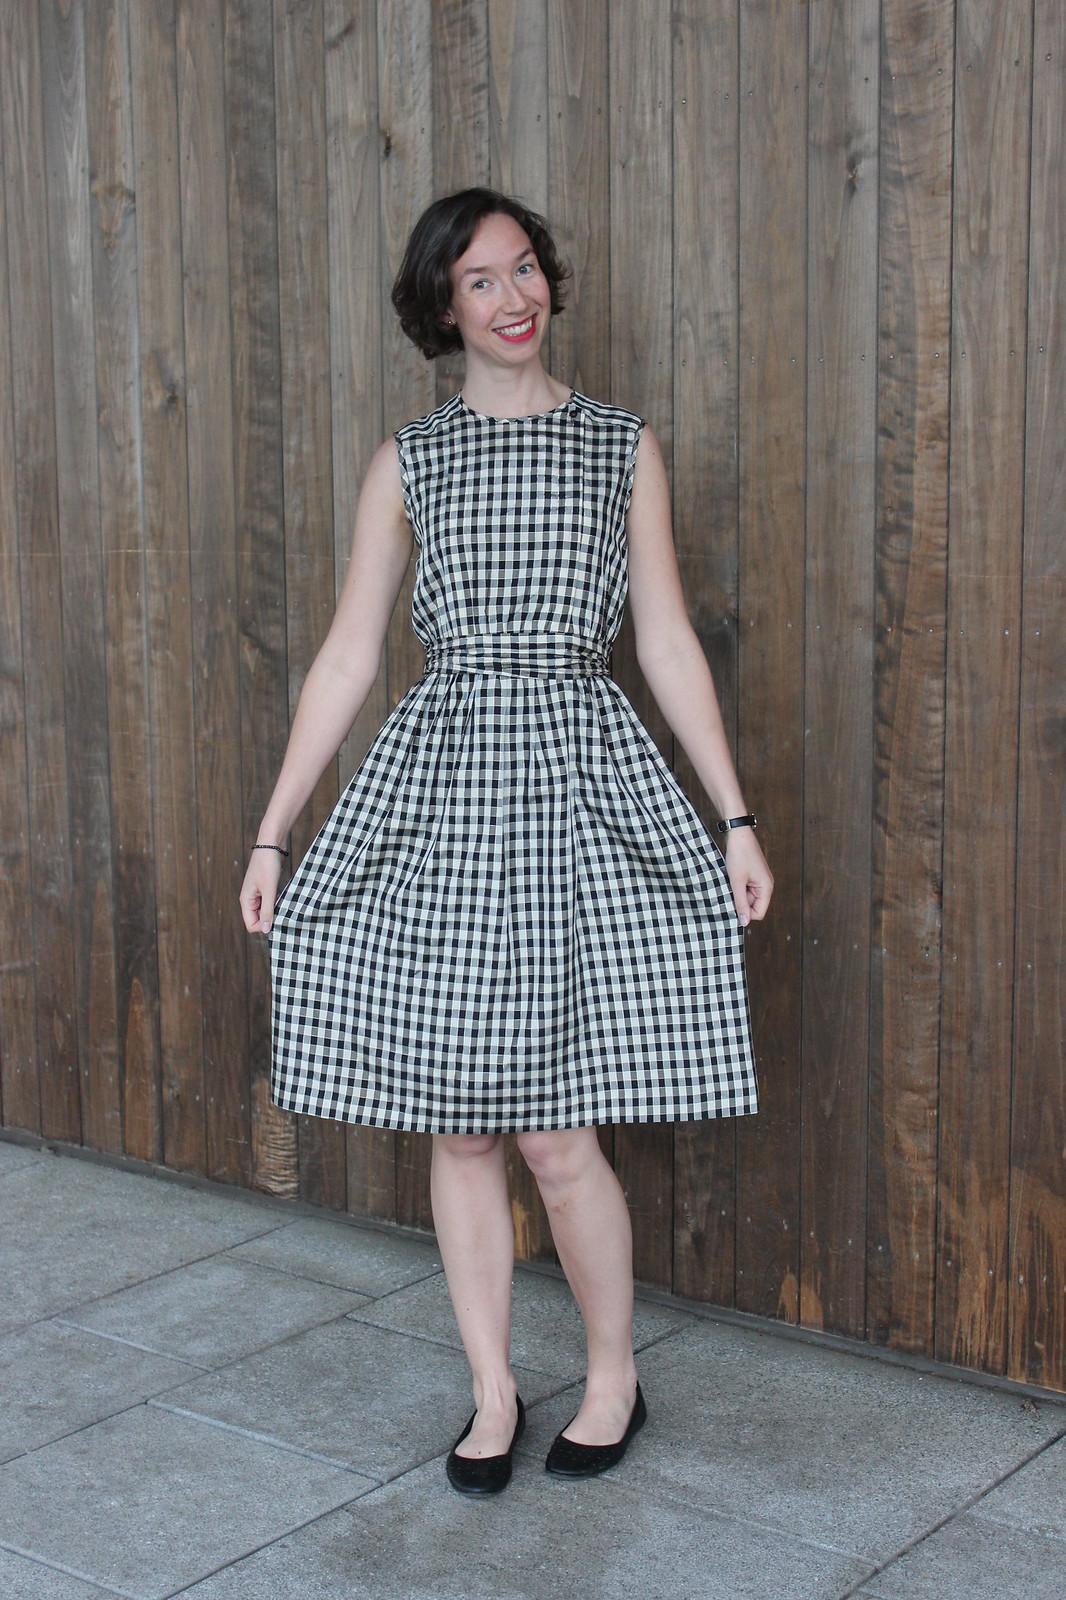 Preppy dress, Et dryss kanel